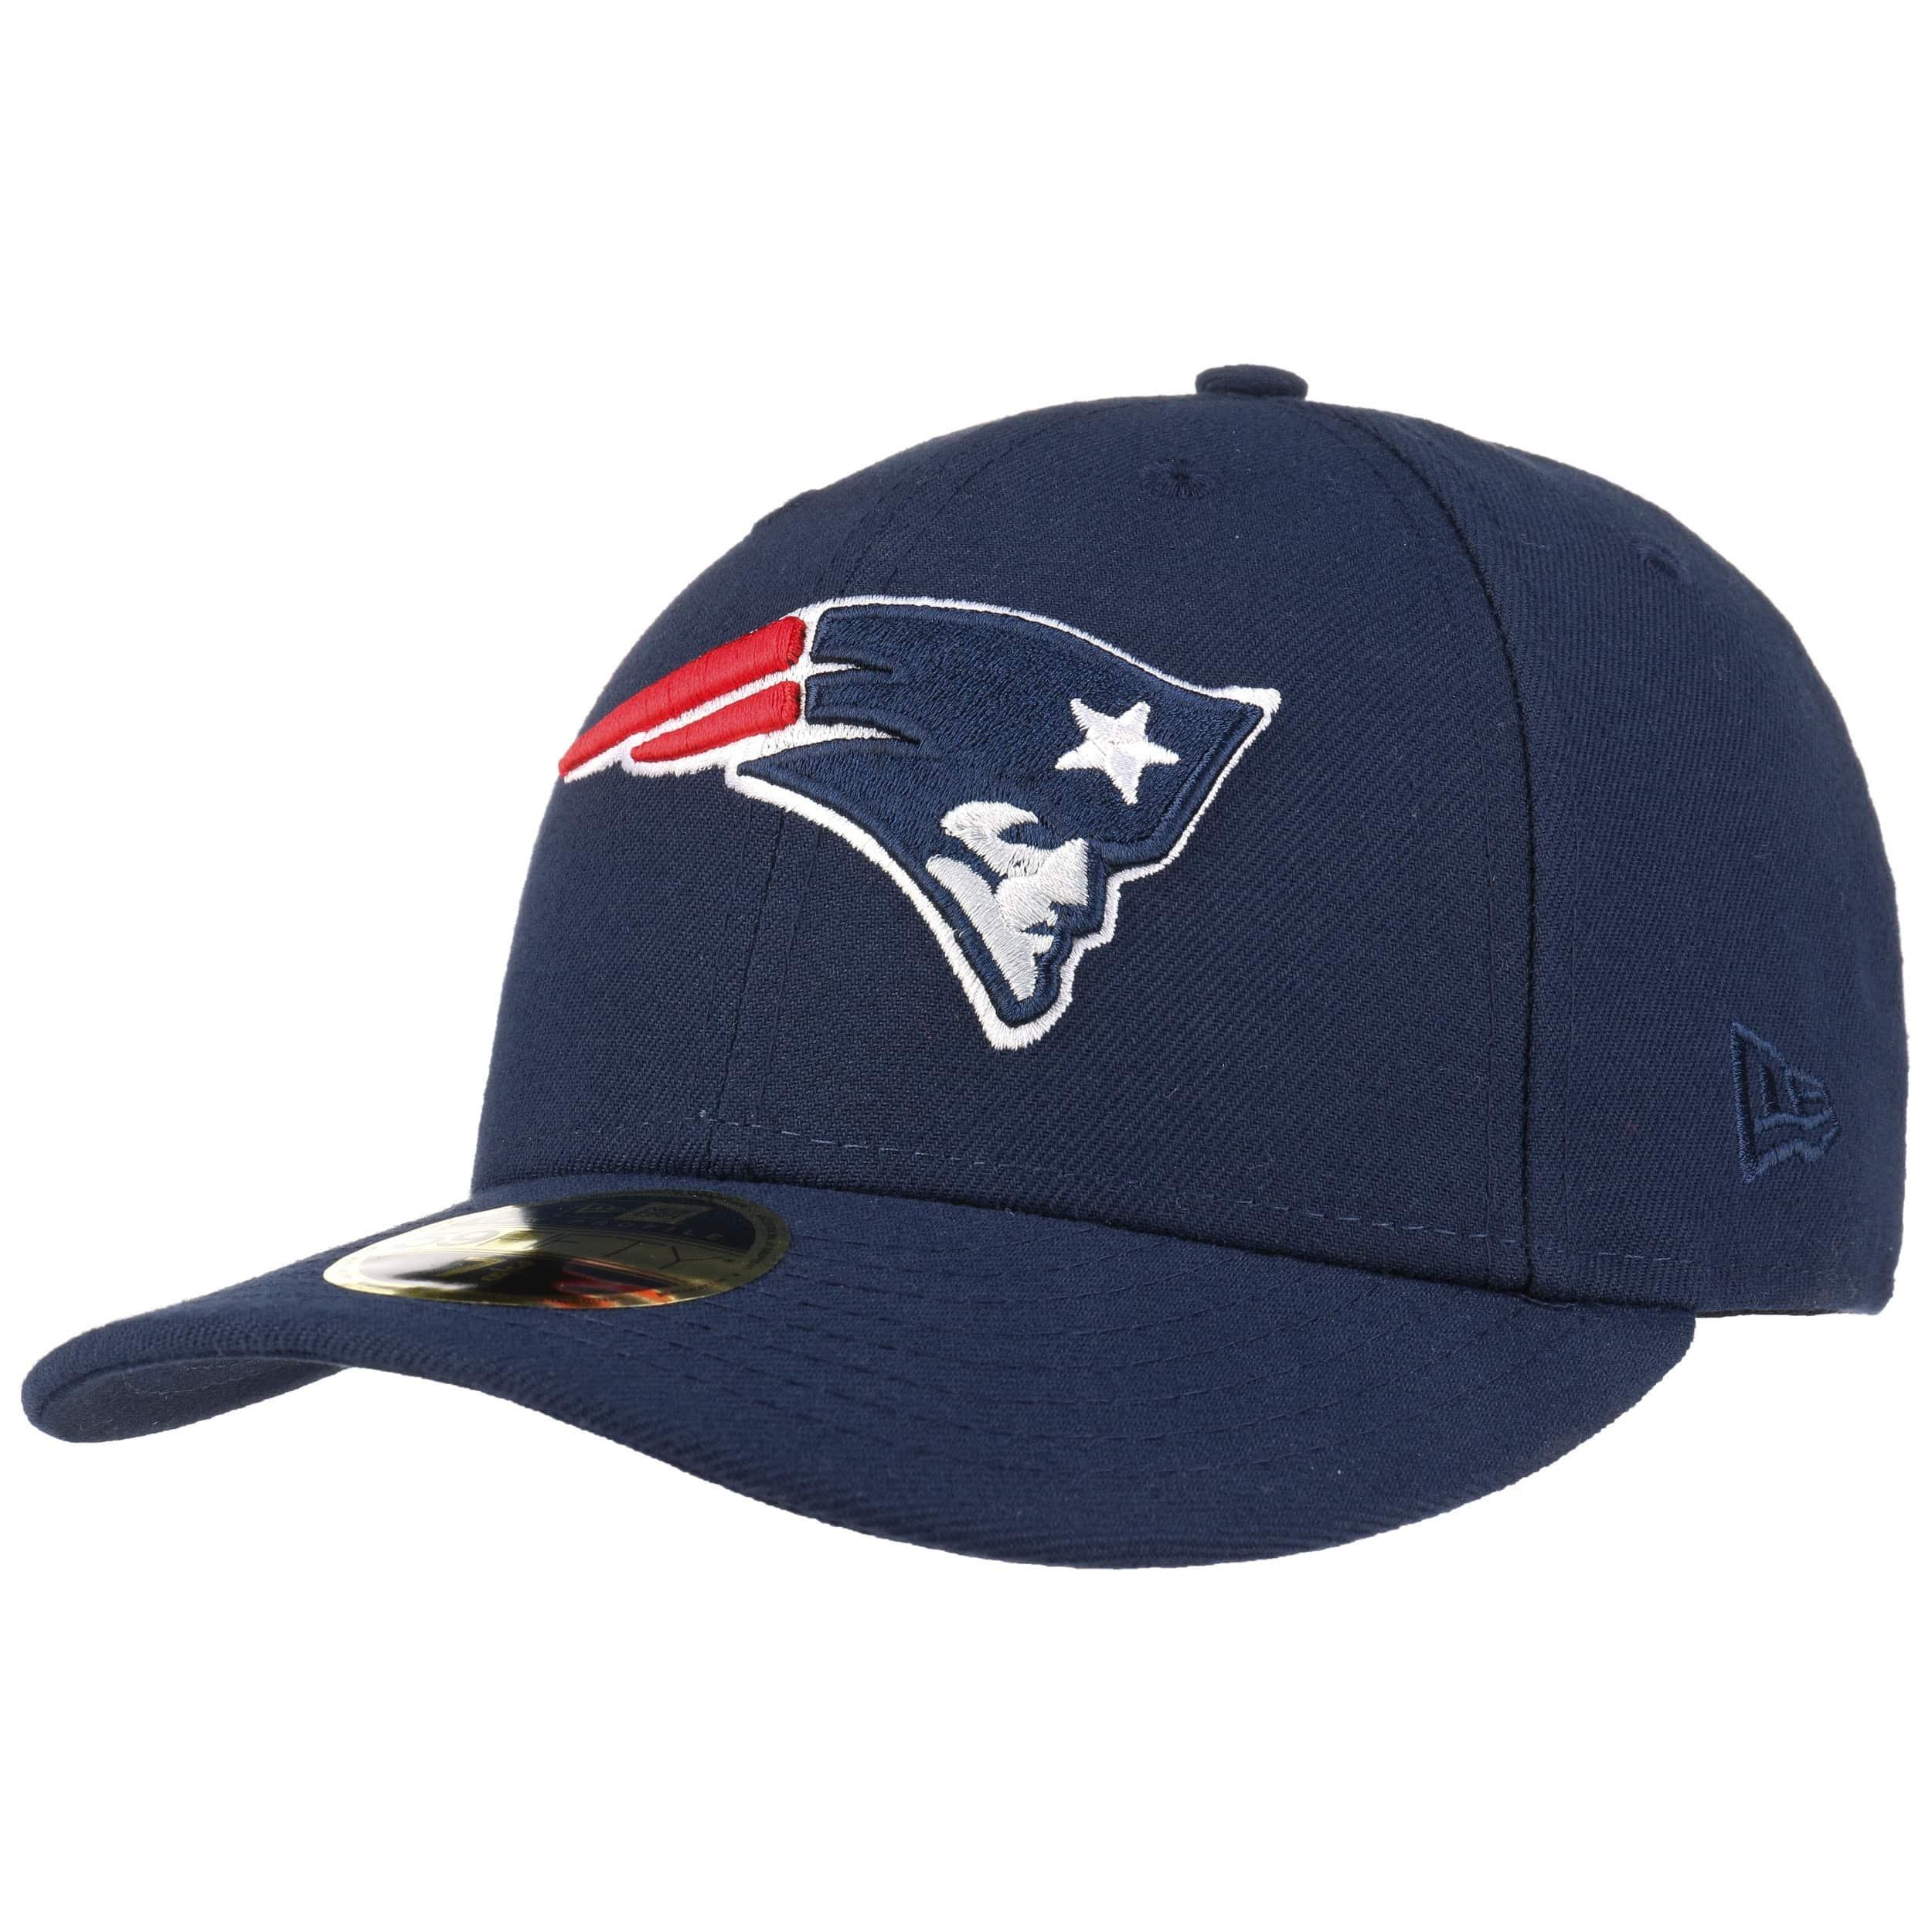 59fifty low profile patriots cap by new era eur 27 95 hats caps beanies shop online. Black Bedroom Furniture Sets. Home Design Ideas